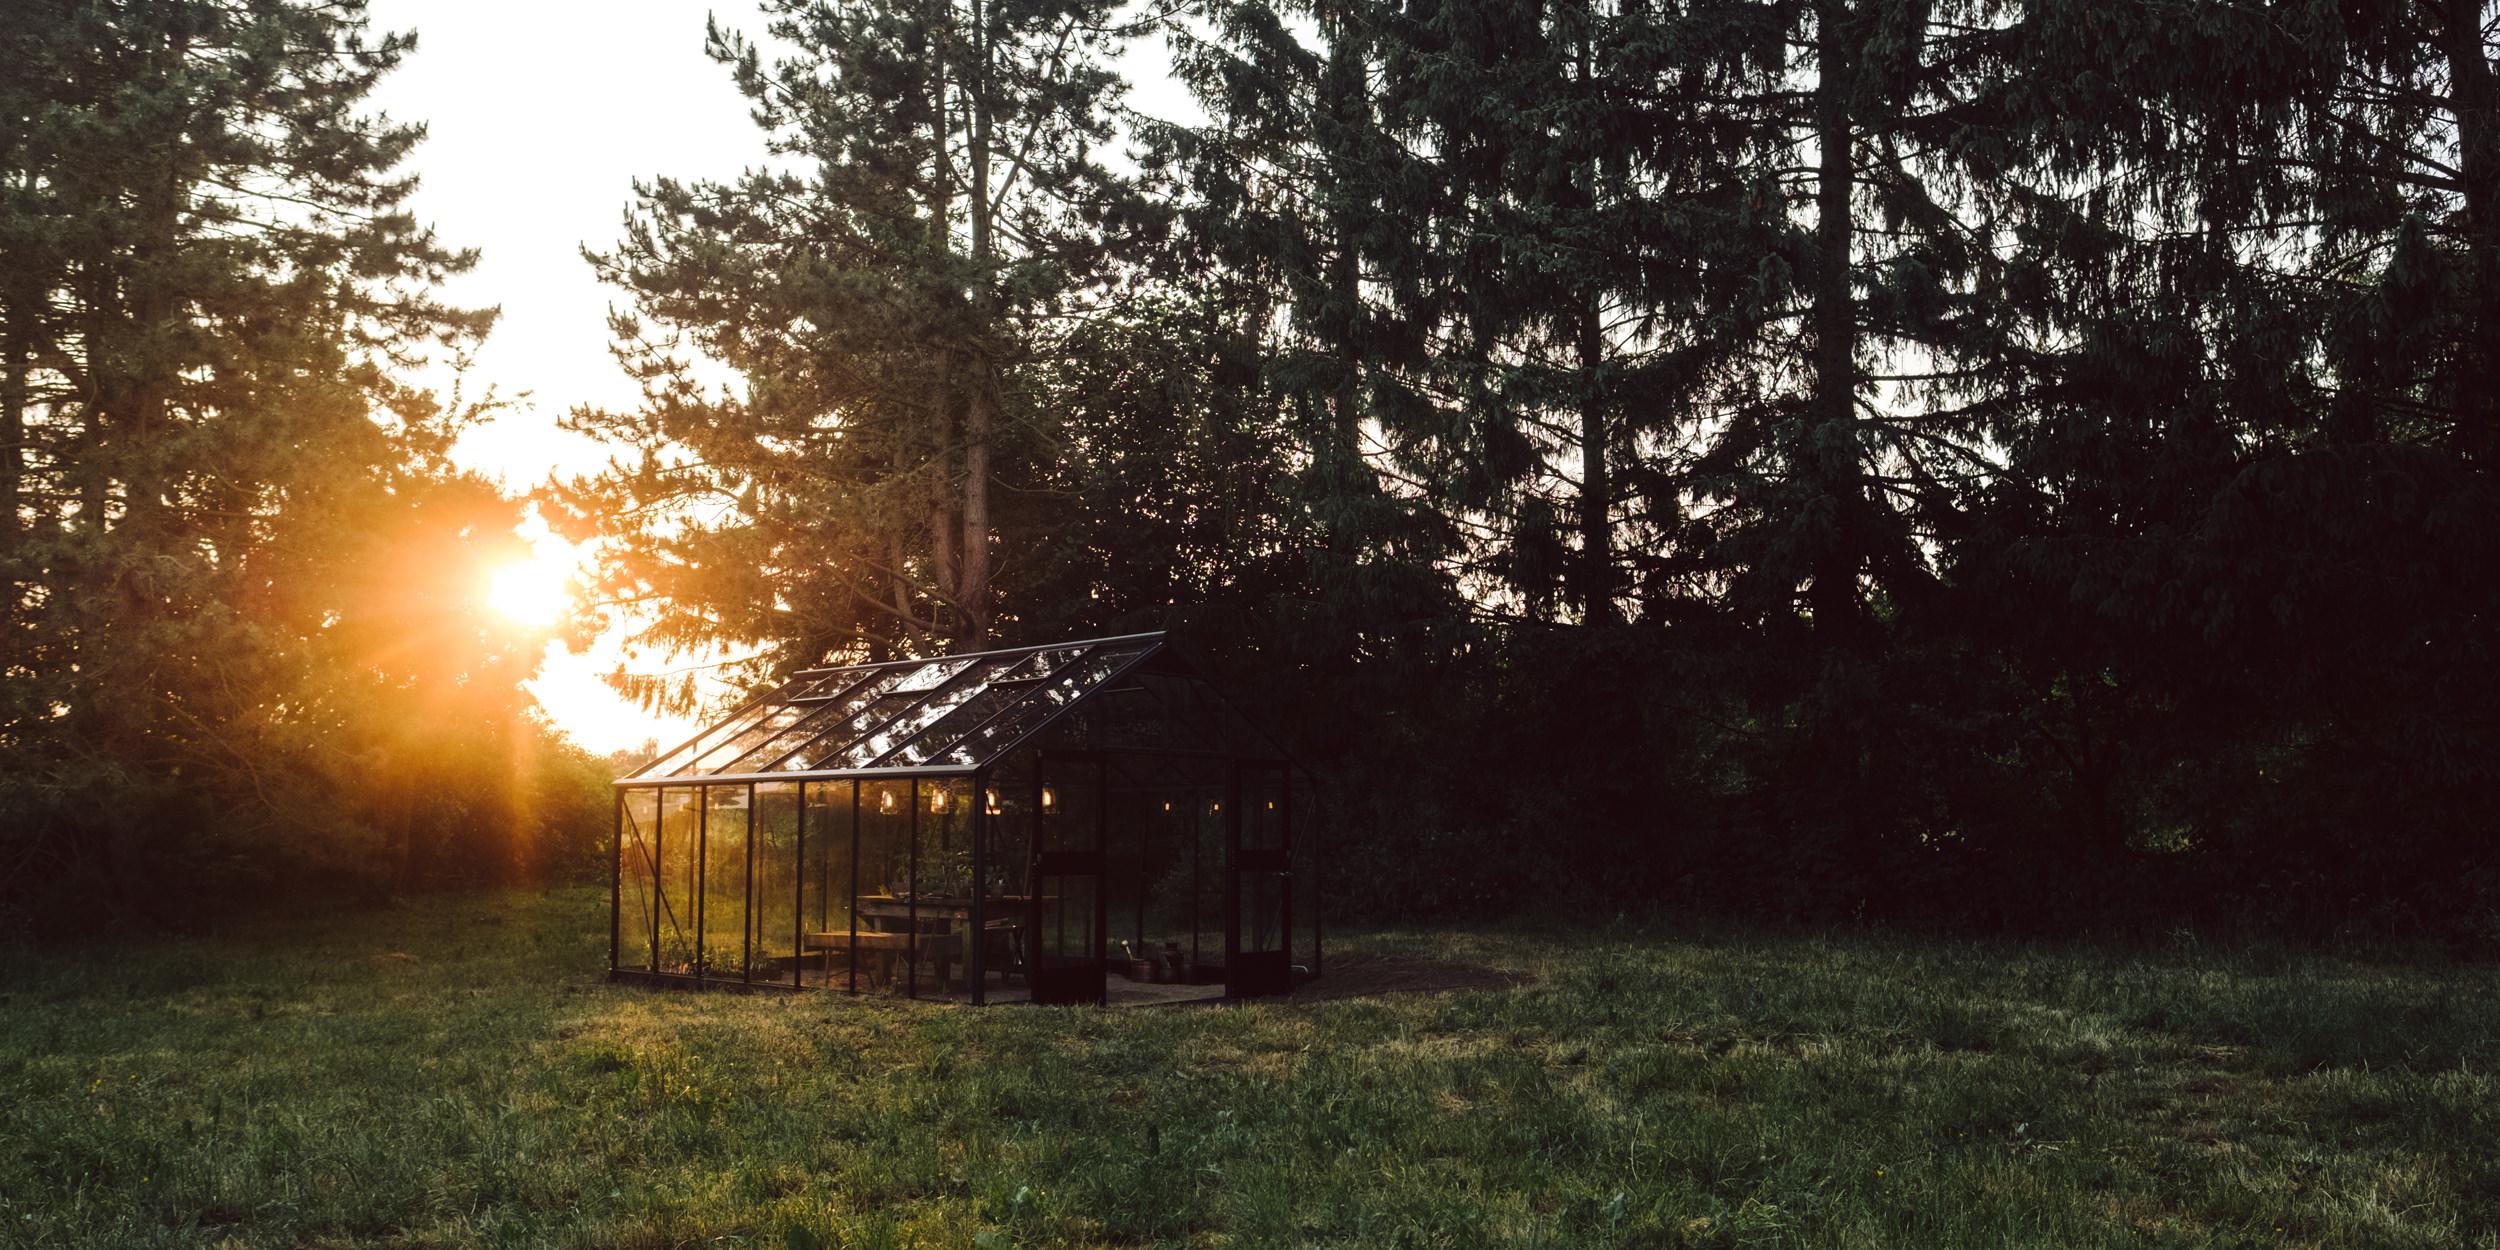 a dream - Yannic & Susann built their gardenhouse!